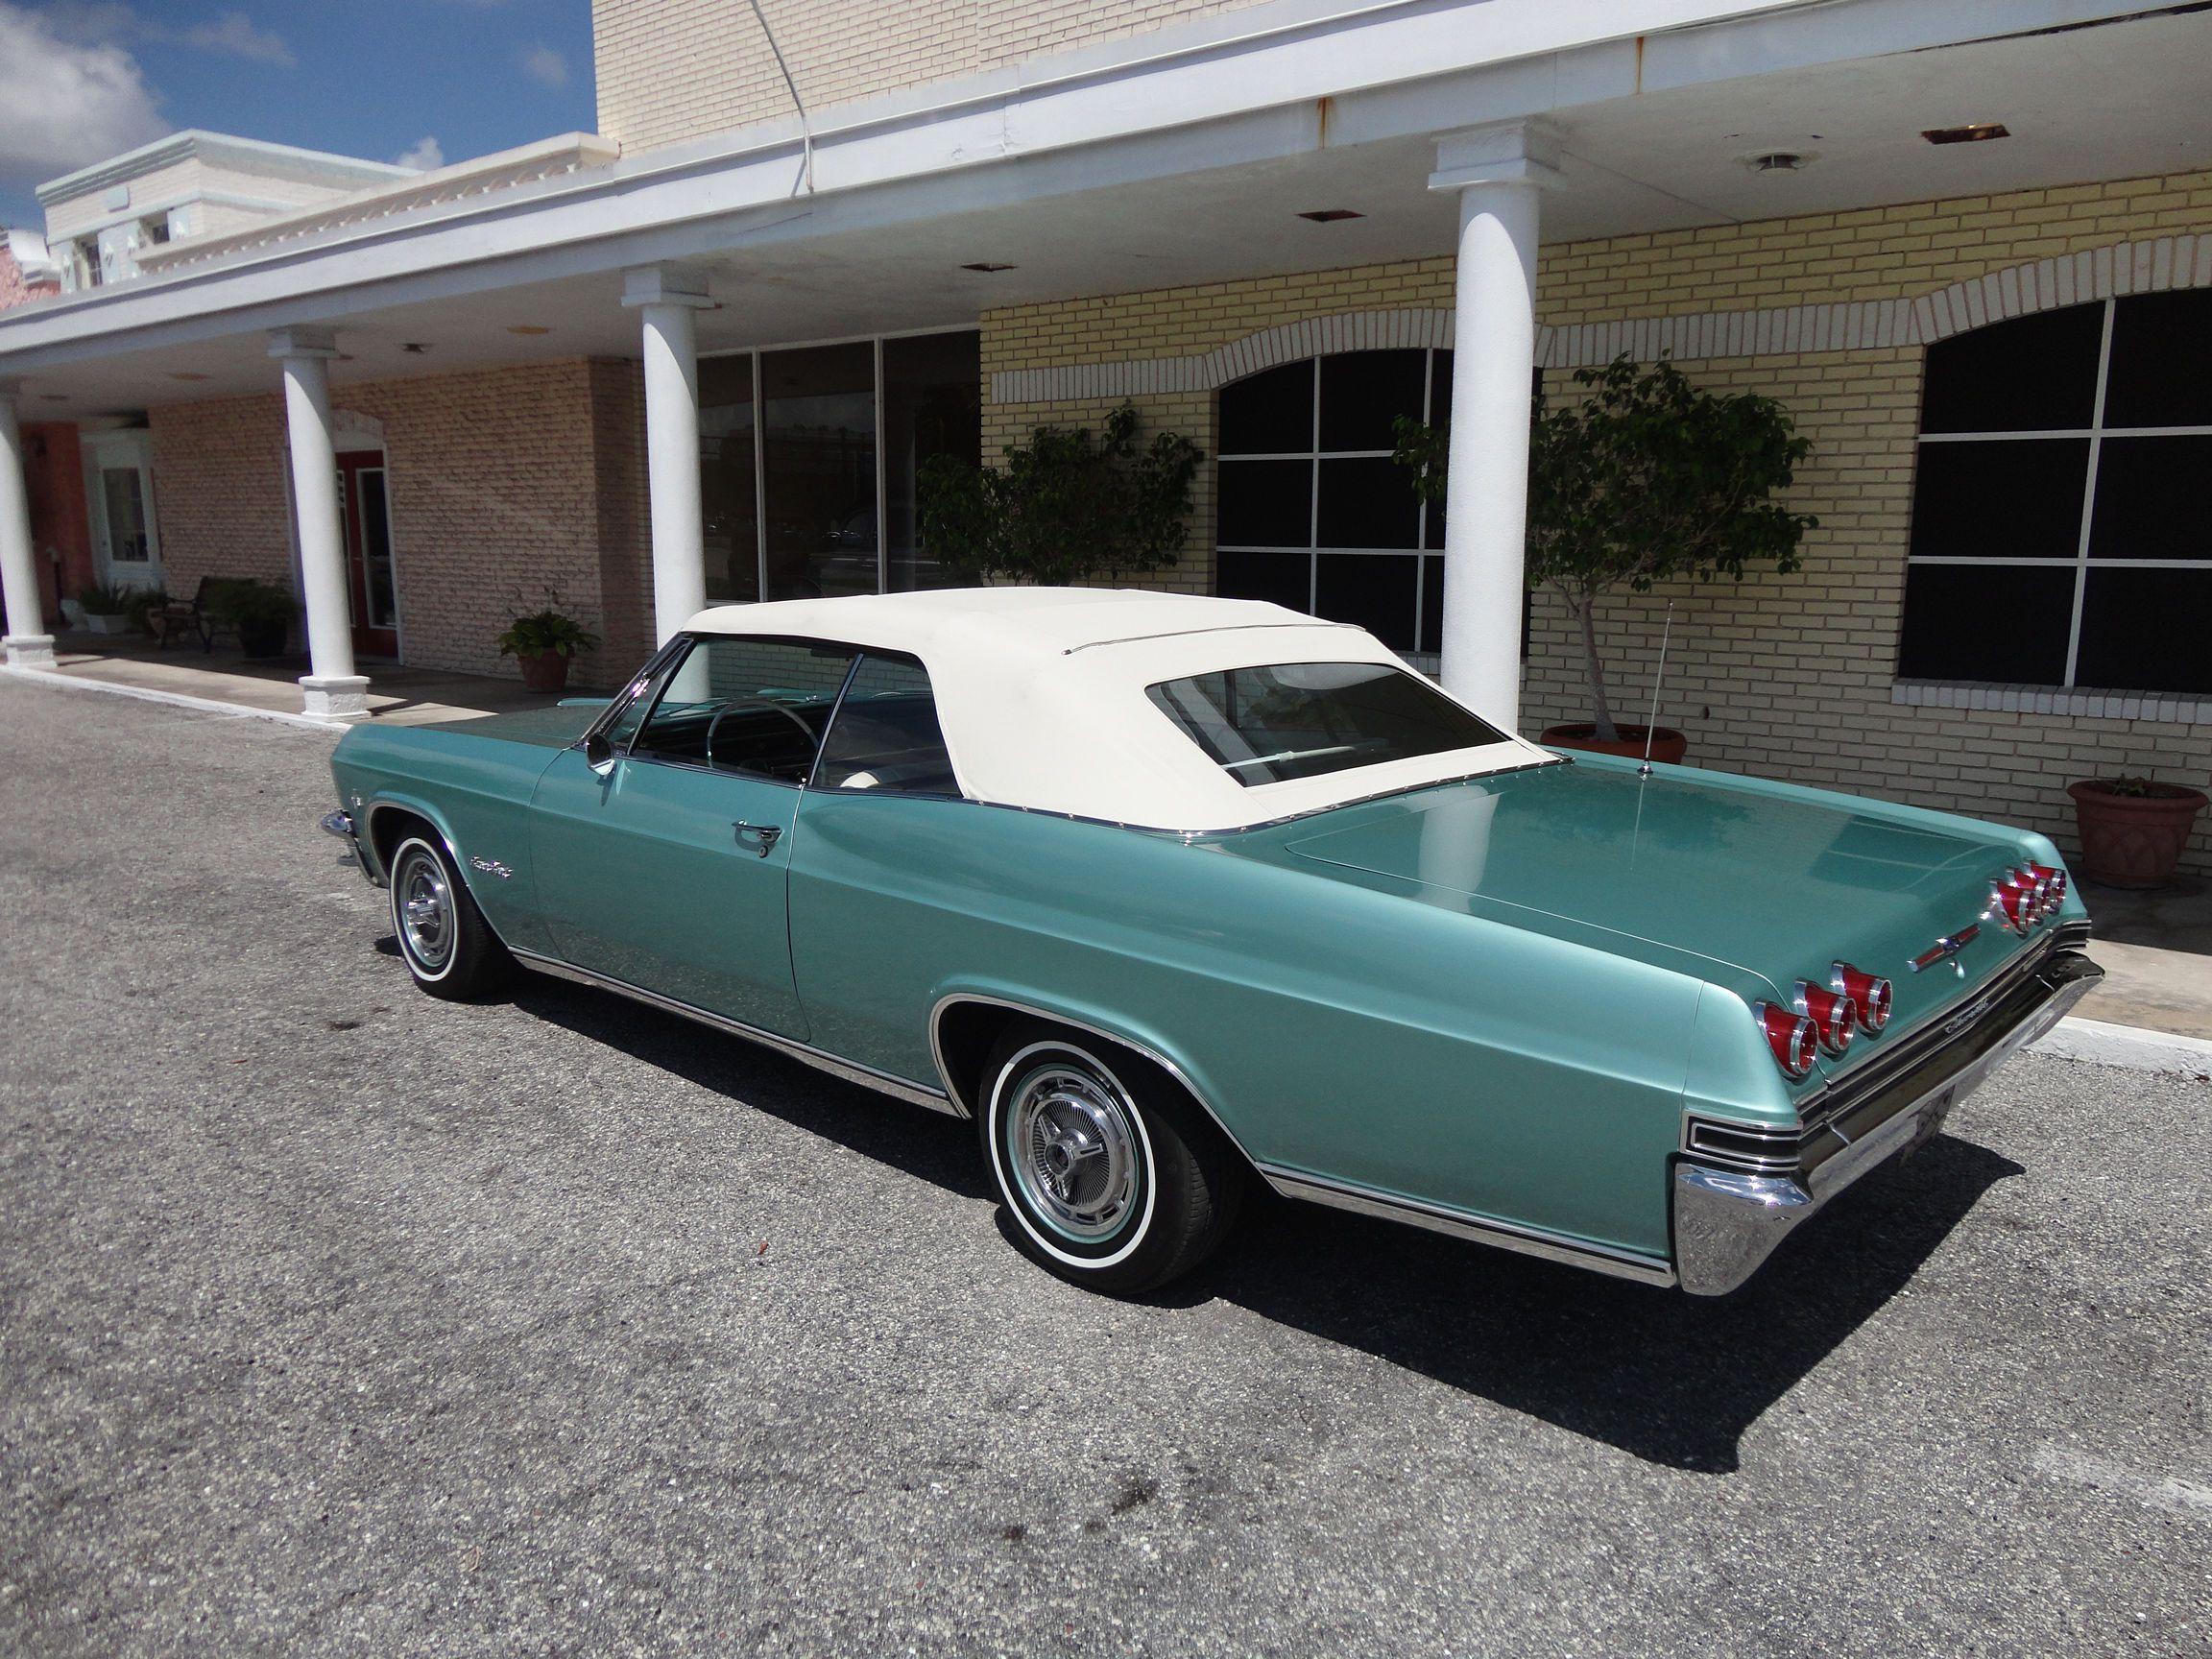 1965 chevrolet impala convertible in artesian turquoise